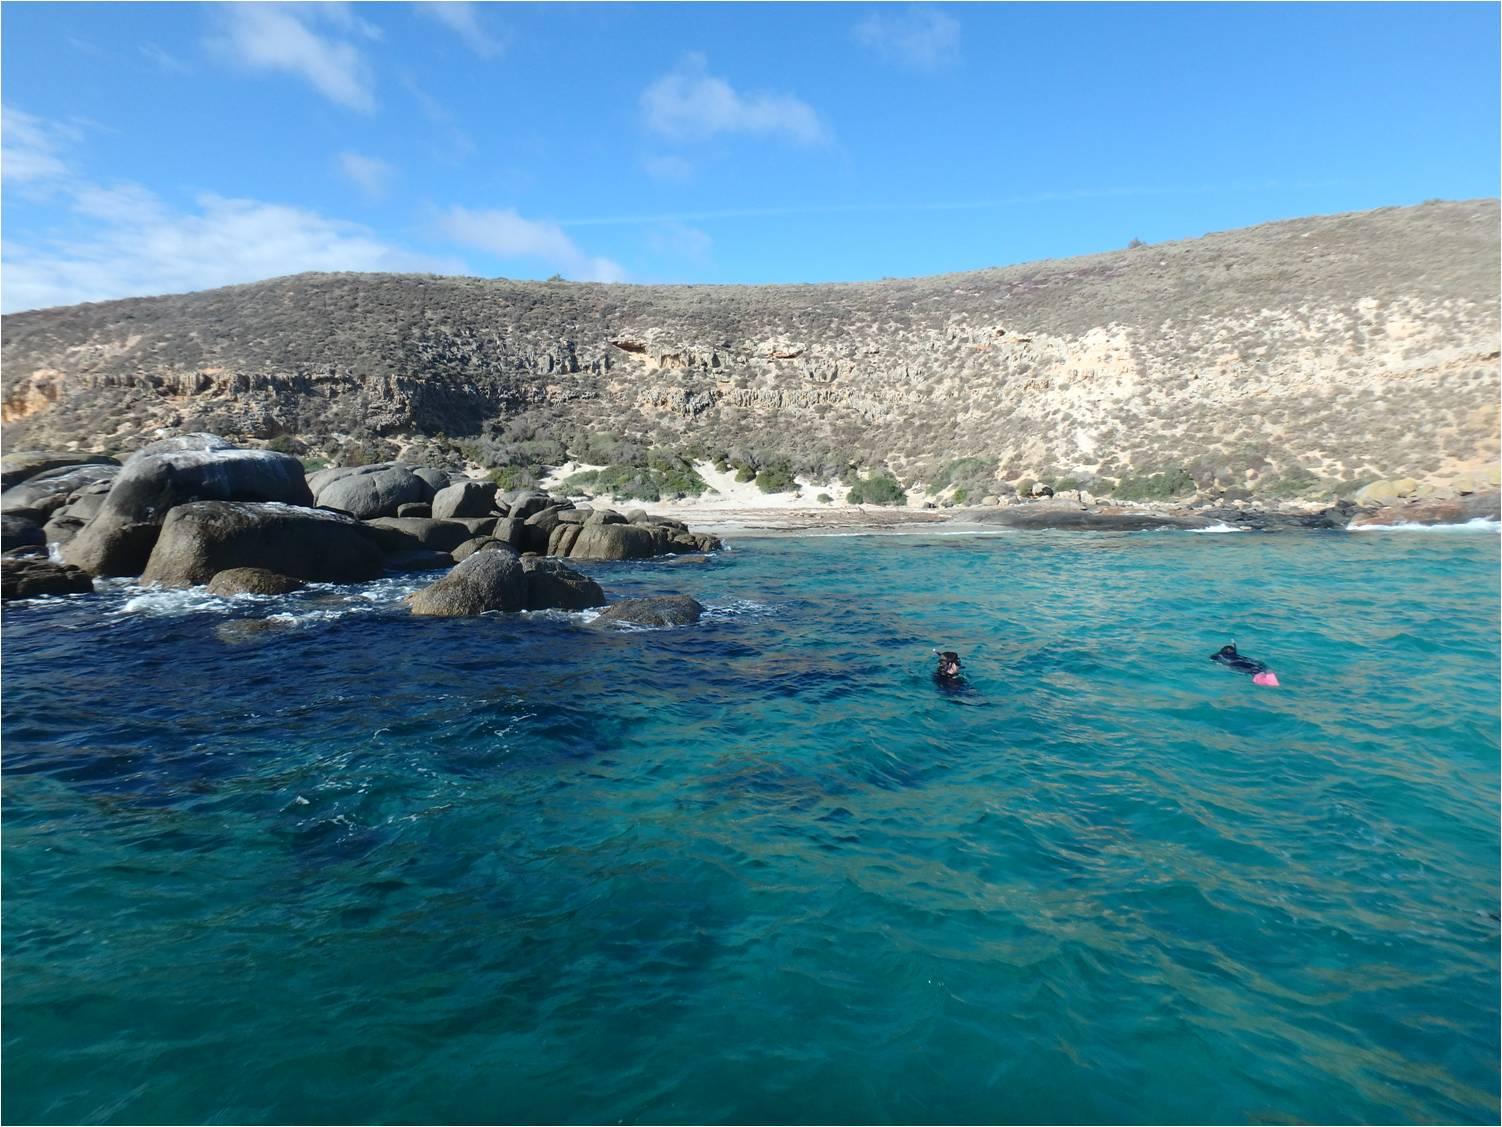 Baie sea lions